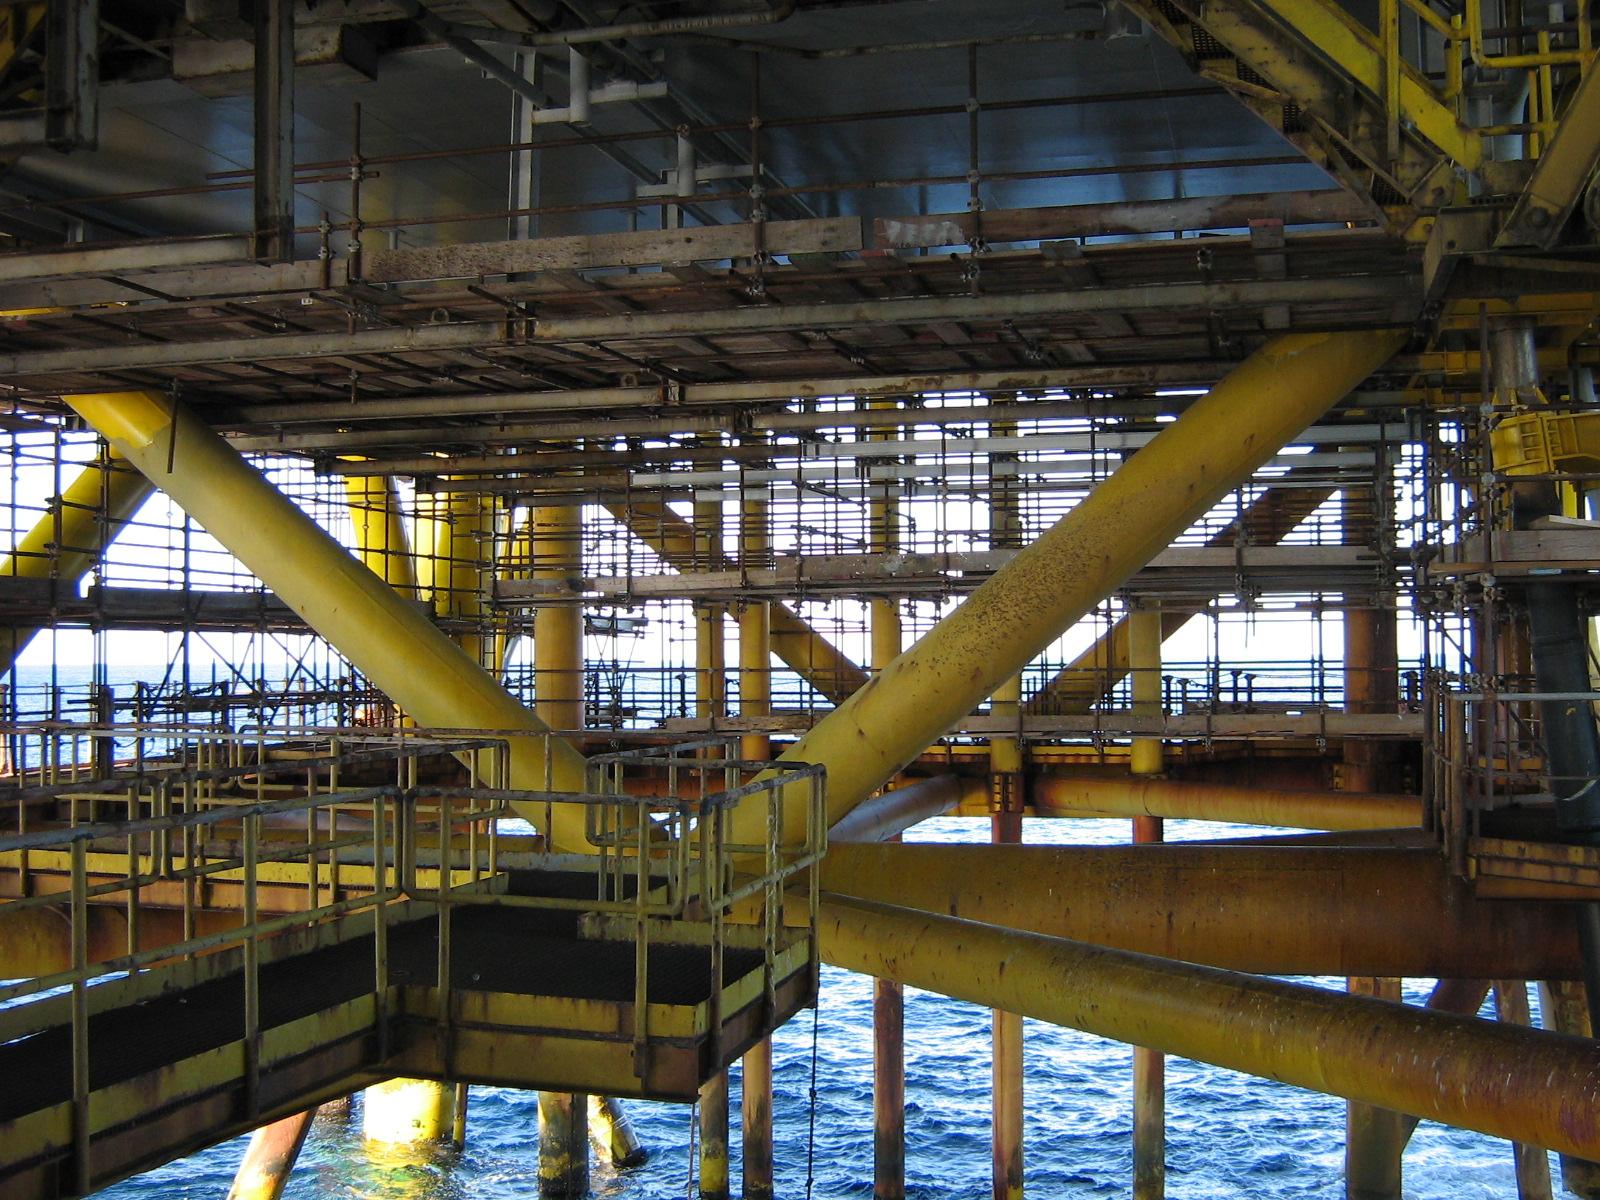 ponteggio a sbalzo sospeso a tubo e giunto piattaforma petrolifera vega